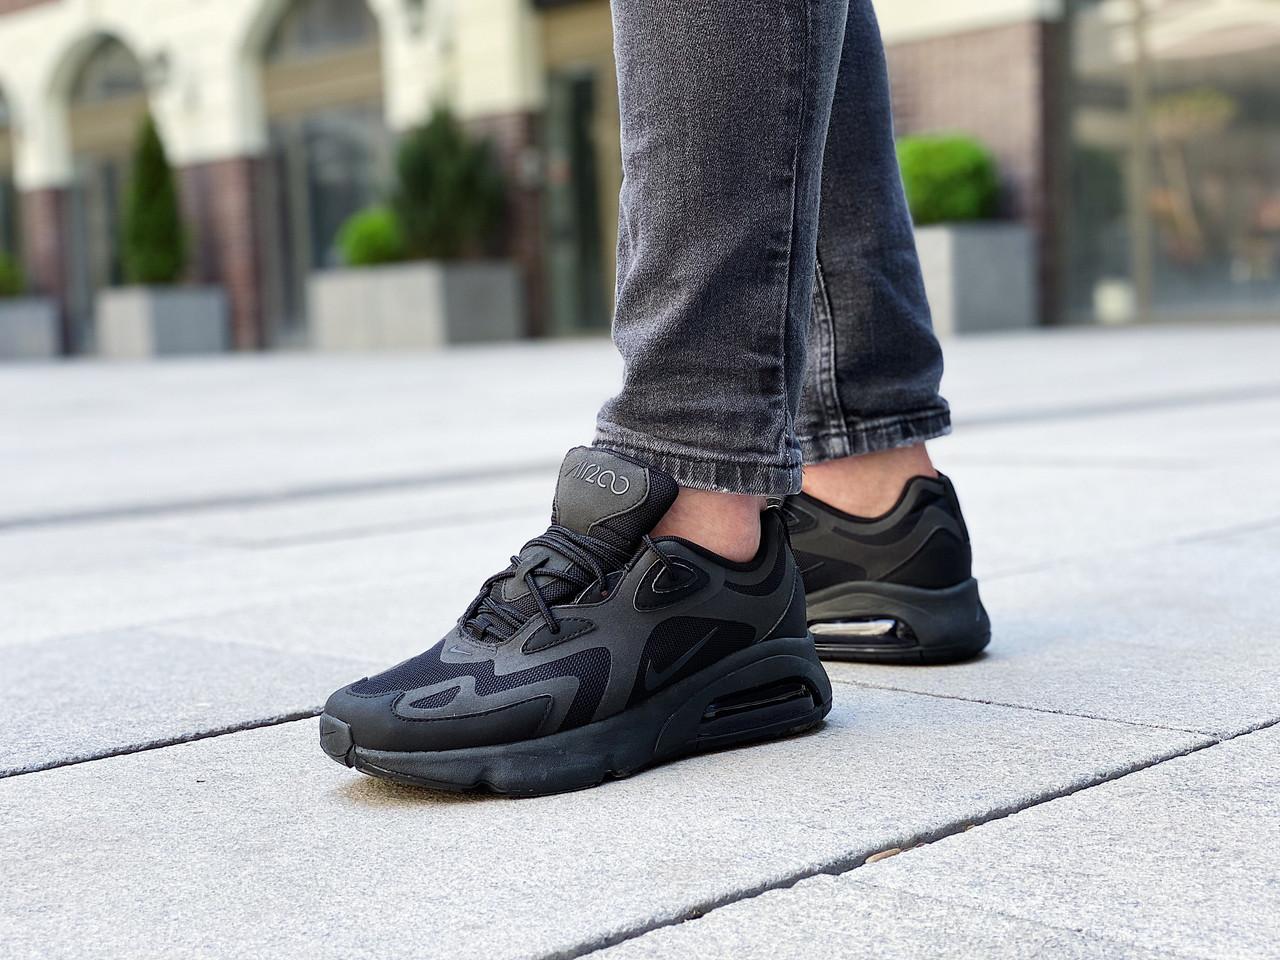 Кроссовки мужские Nike Air Max 200 / AQ2568-003 (Размеры:41,43,44)